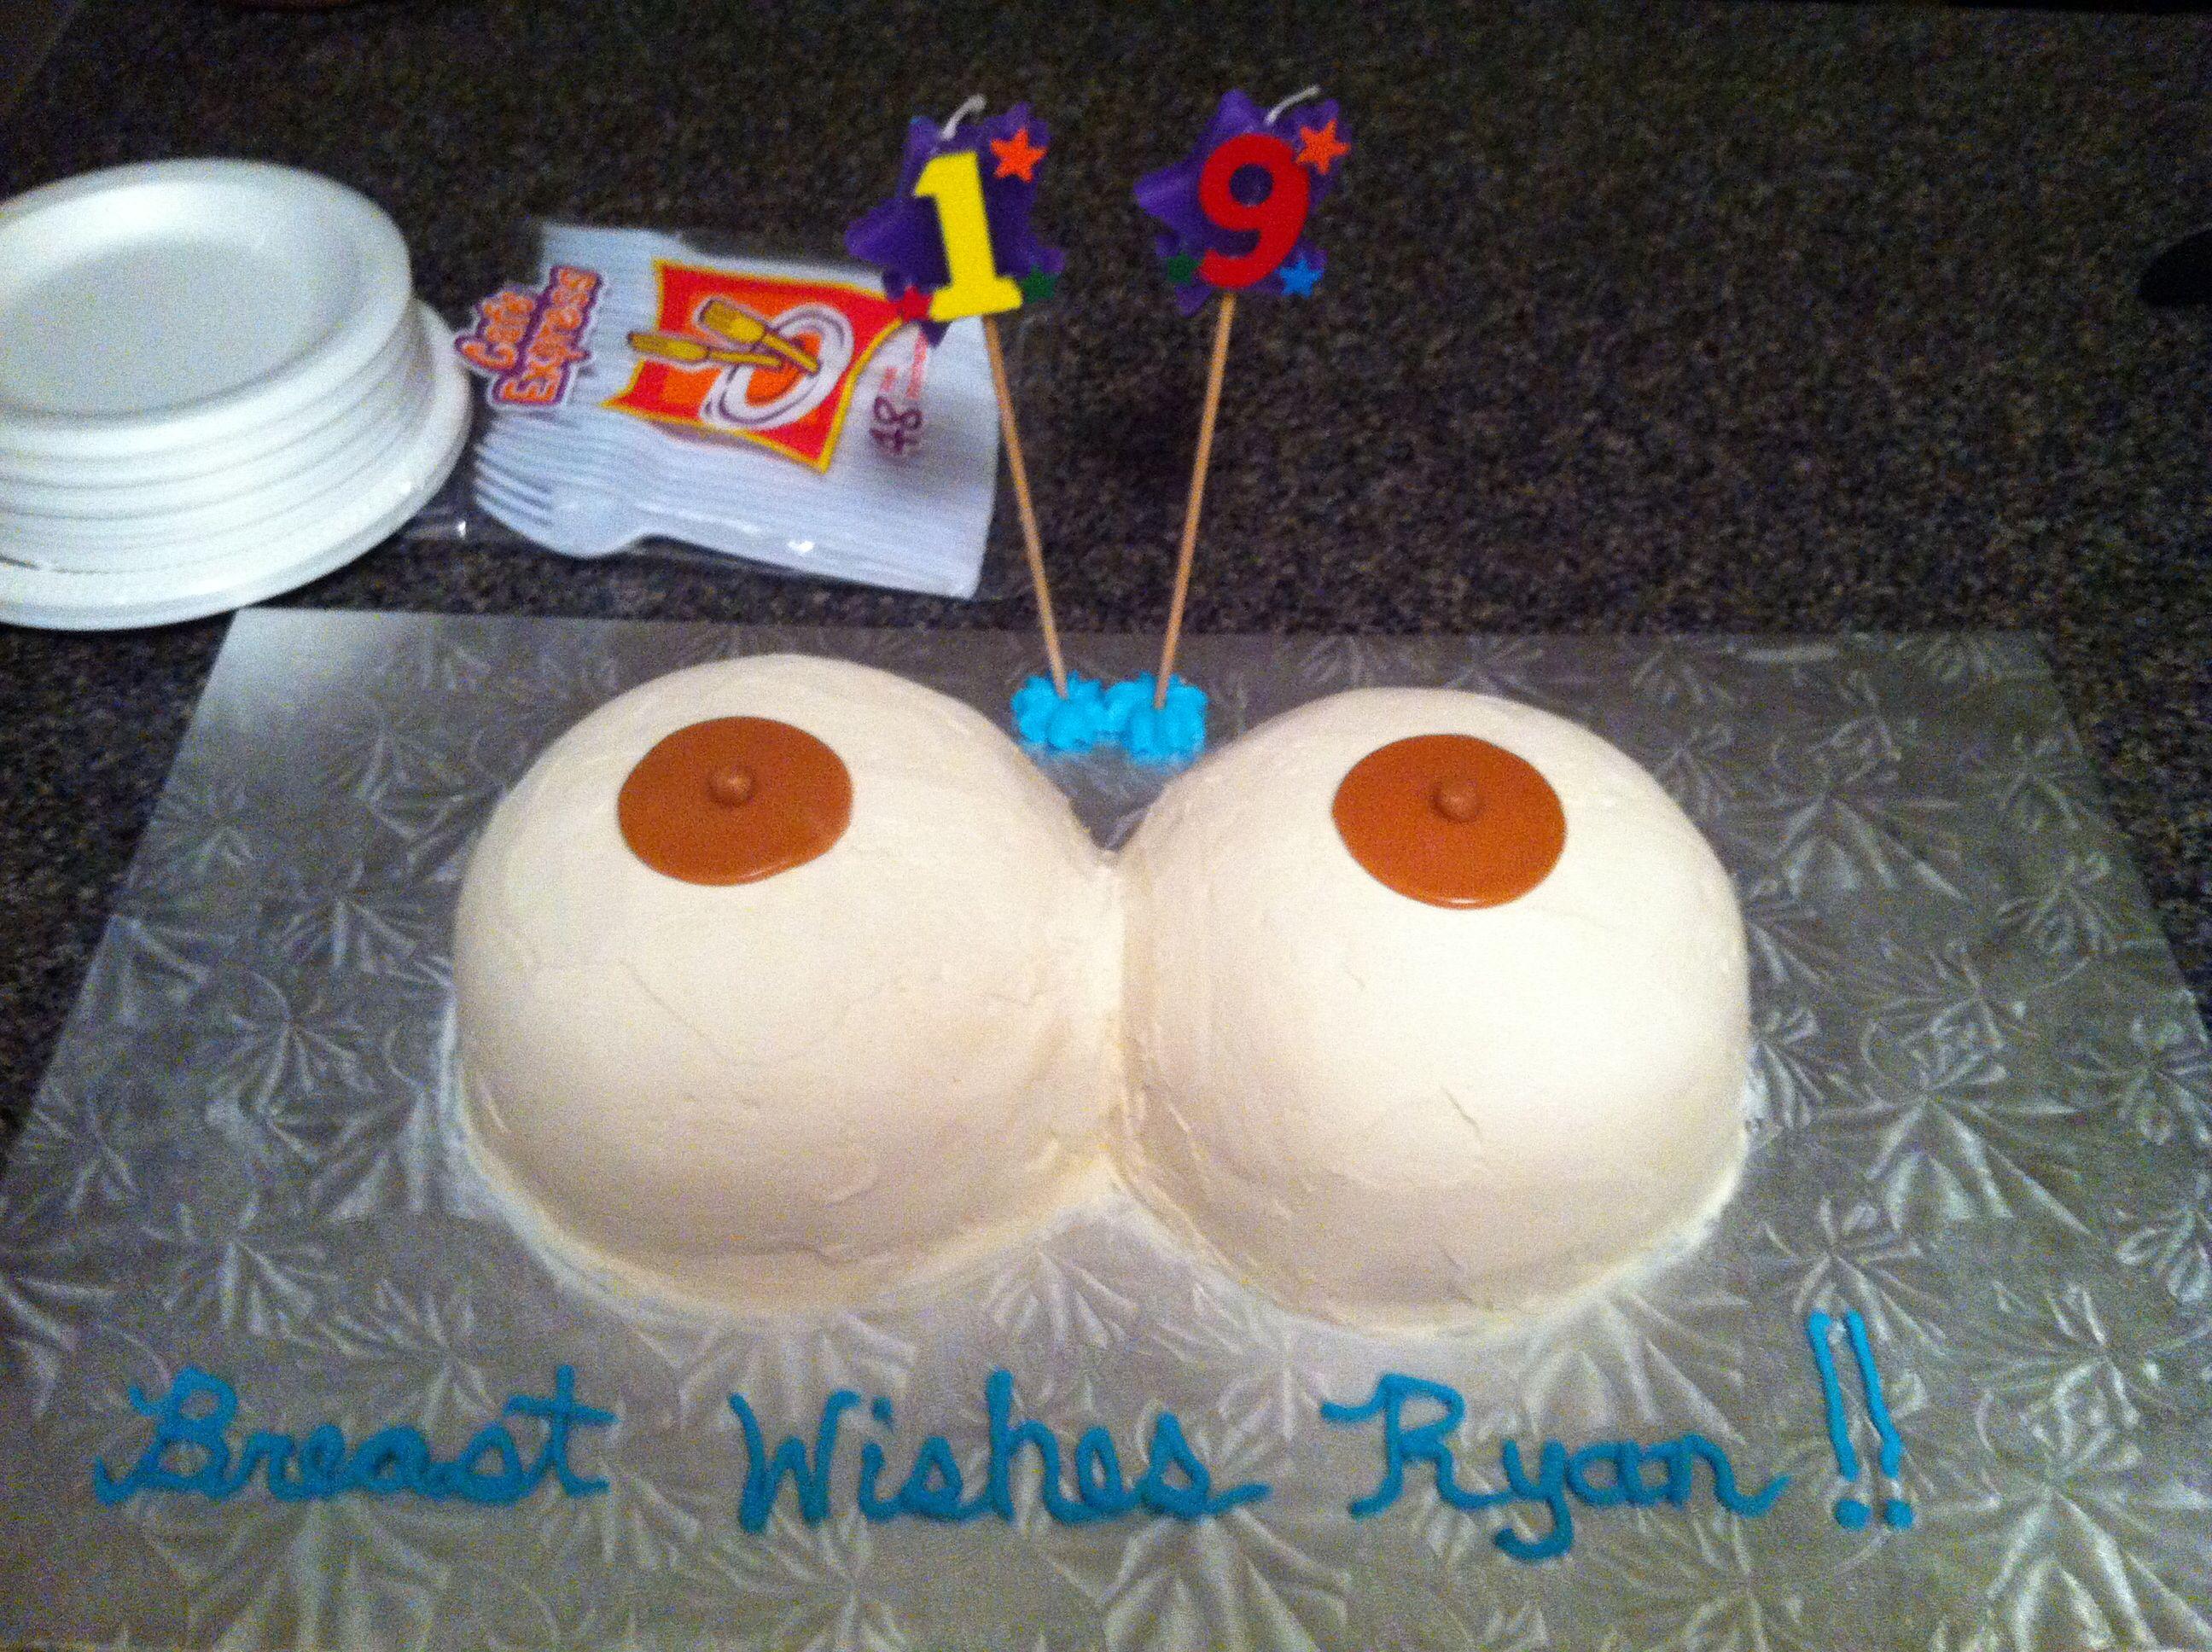 Happy 19 Birthday Ryan Boob Cake Boob Chocolate And One Boob